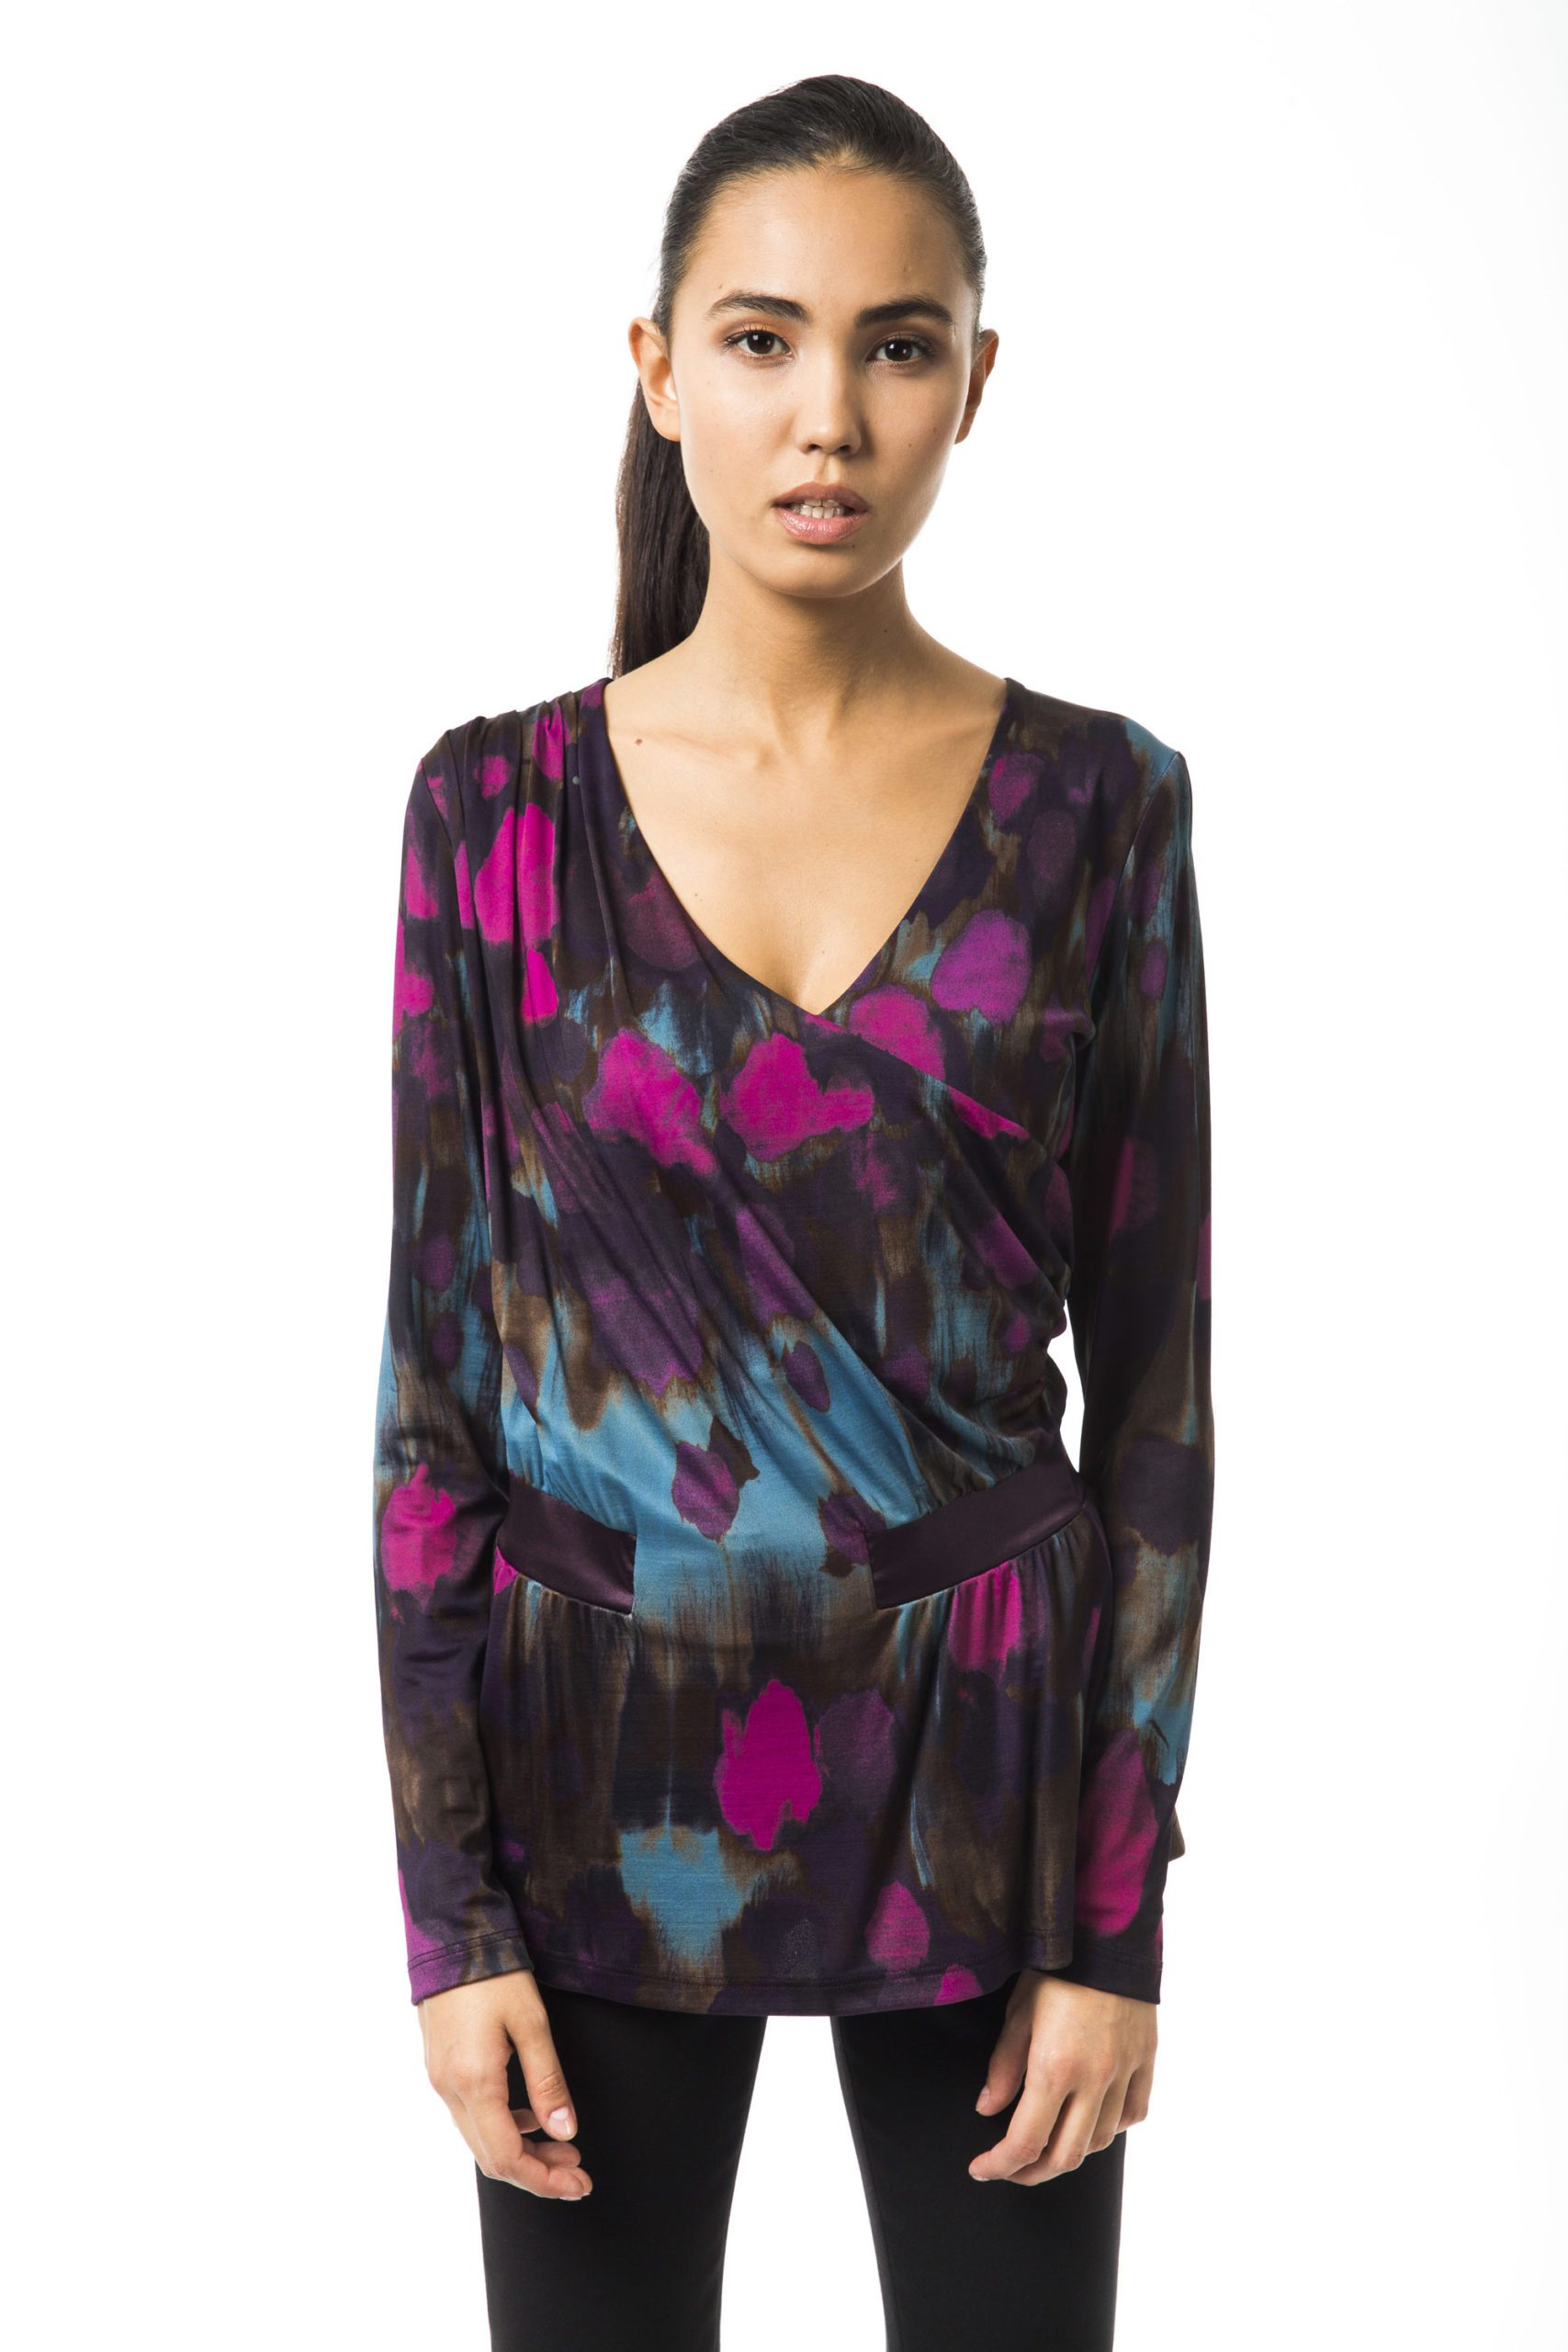 BYBLOS Women's Verdemuffa T-Shirt Multicolor BY1234684 - IT42 | S